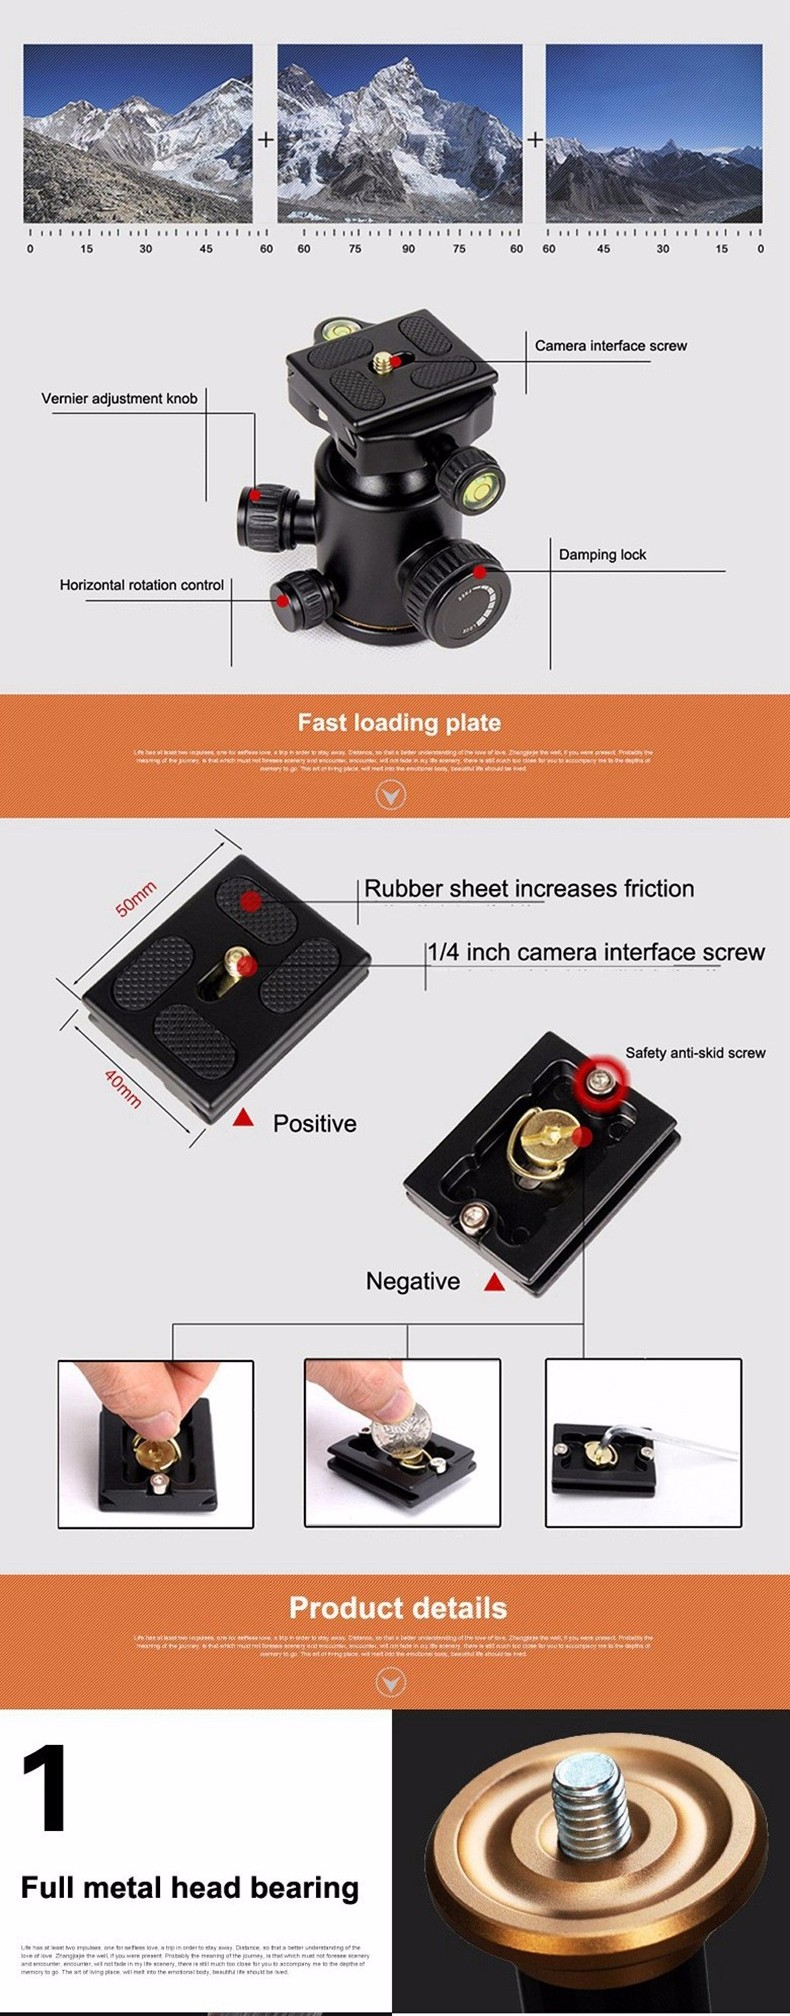 Q666C-most-hot-sell-camera-tripod_04